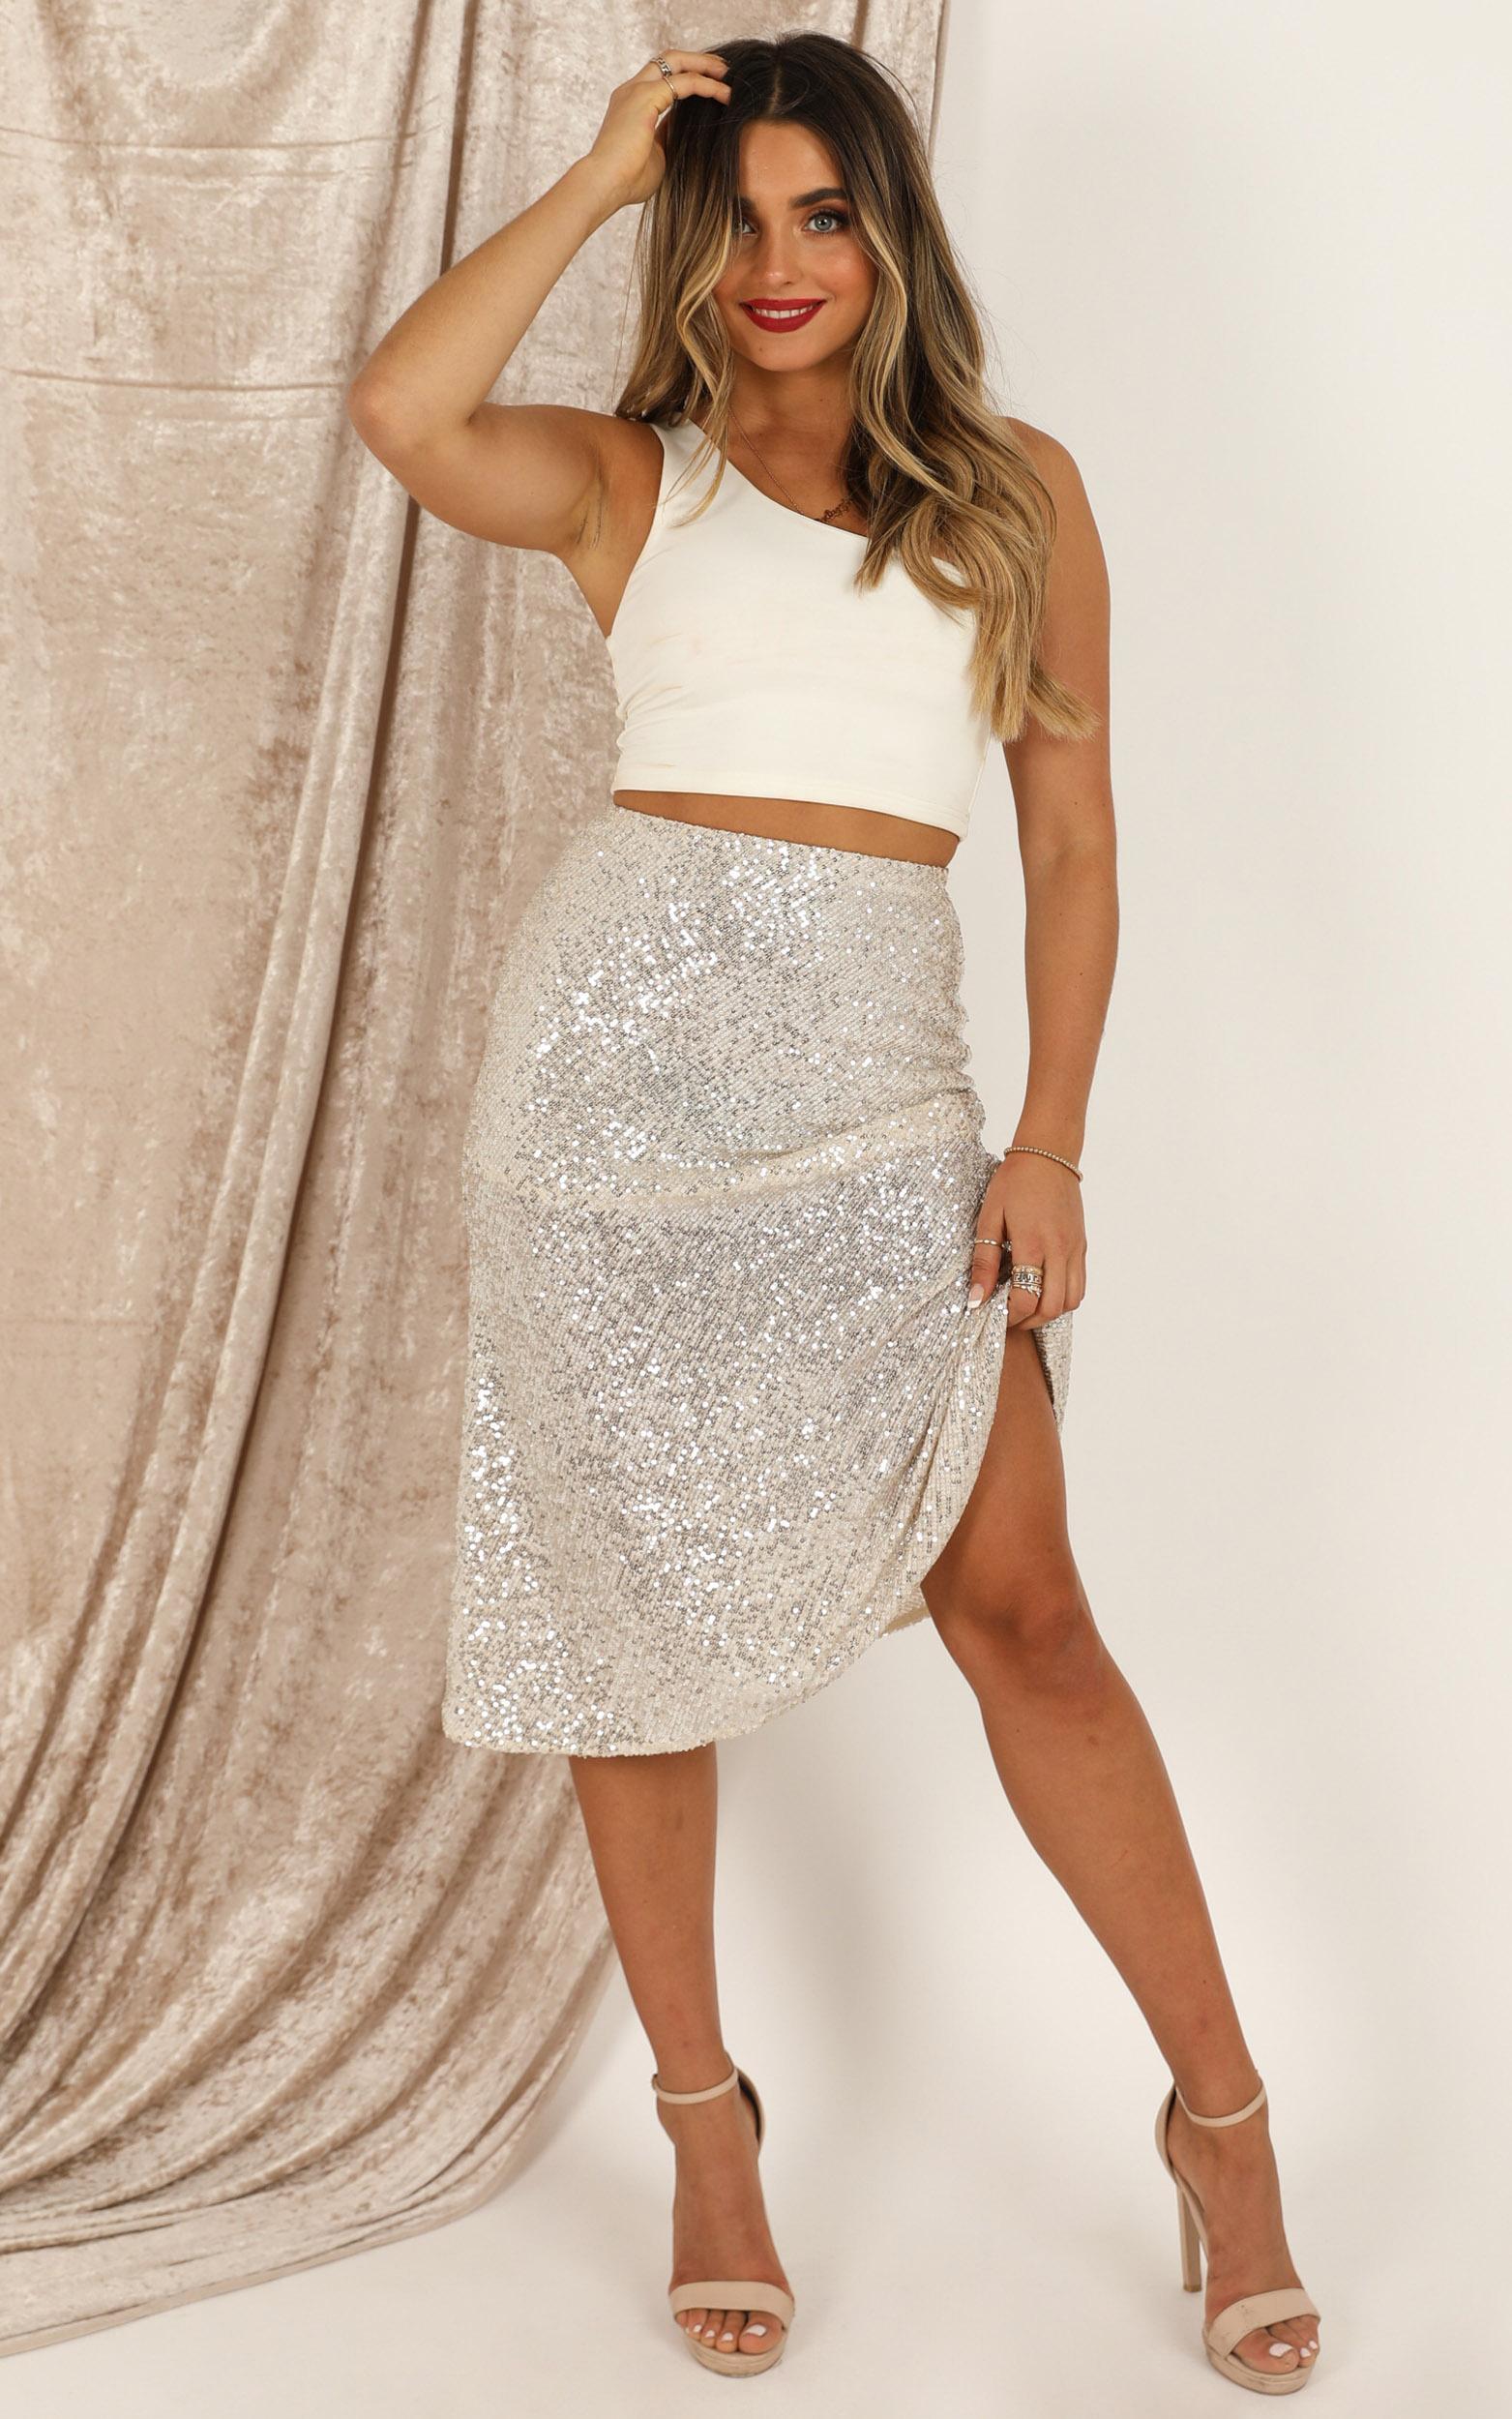 Sparkle For Days skirt in cream glitter - 12 (L), Cream, hi-res image number null